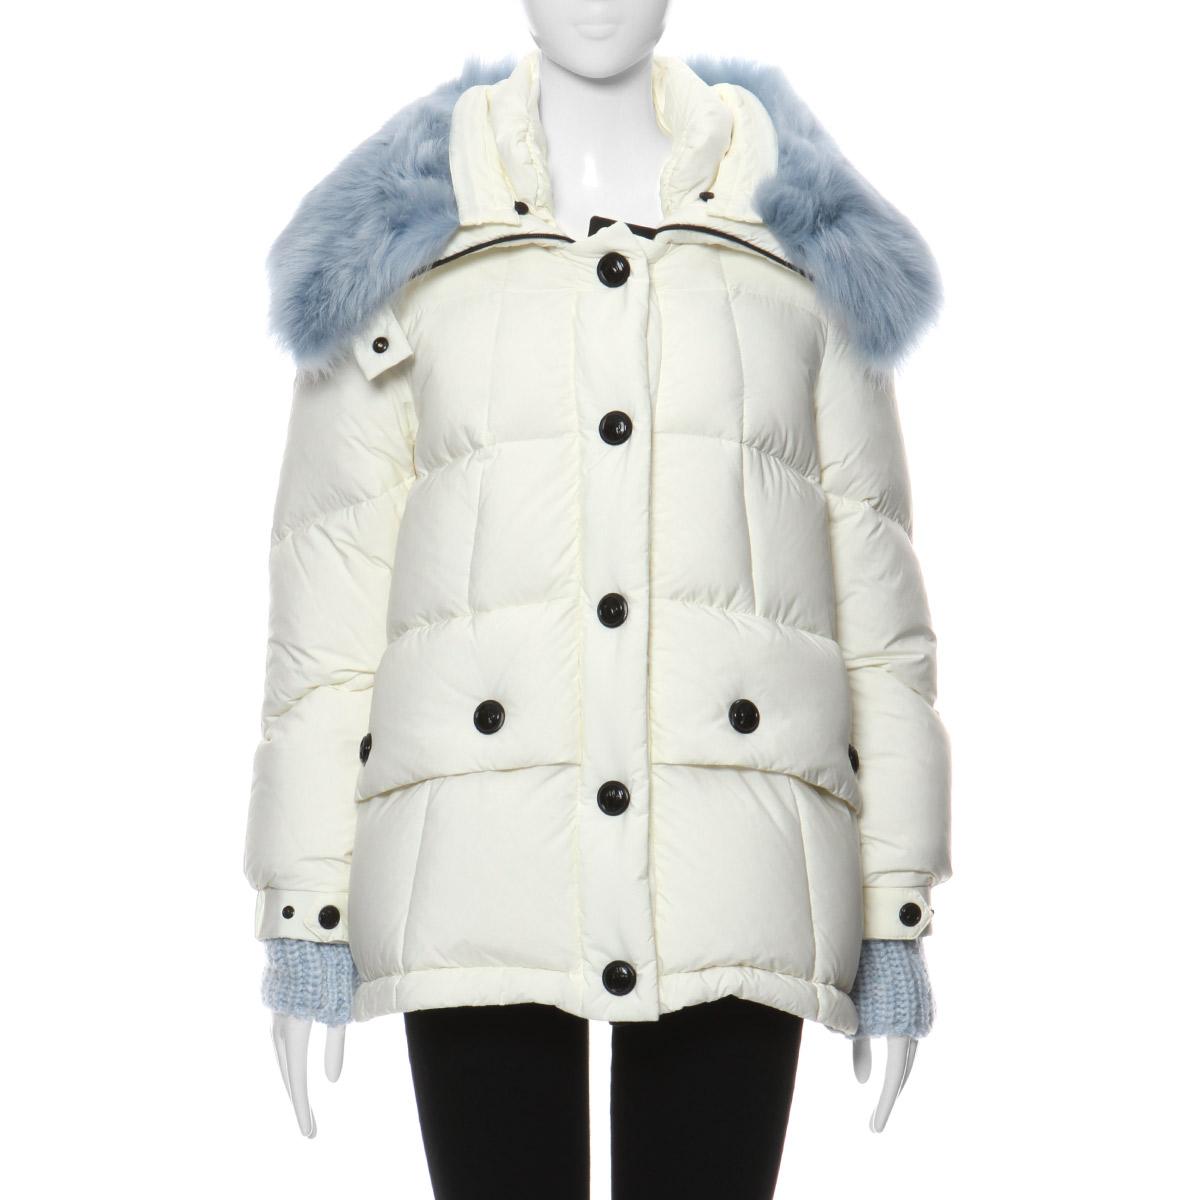 756b53593 Monk rail Grenoble MONCLER GRENOBLE outer Lady's CAREZZA 53862 04A fur down  jacket CAREZZA カレッツァ WHITE white belonging to